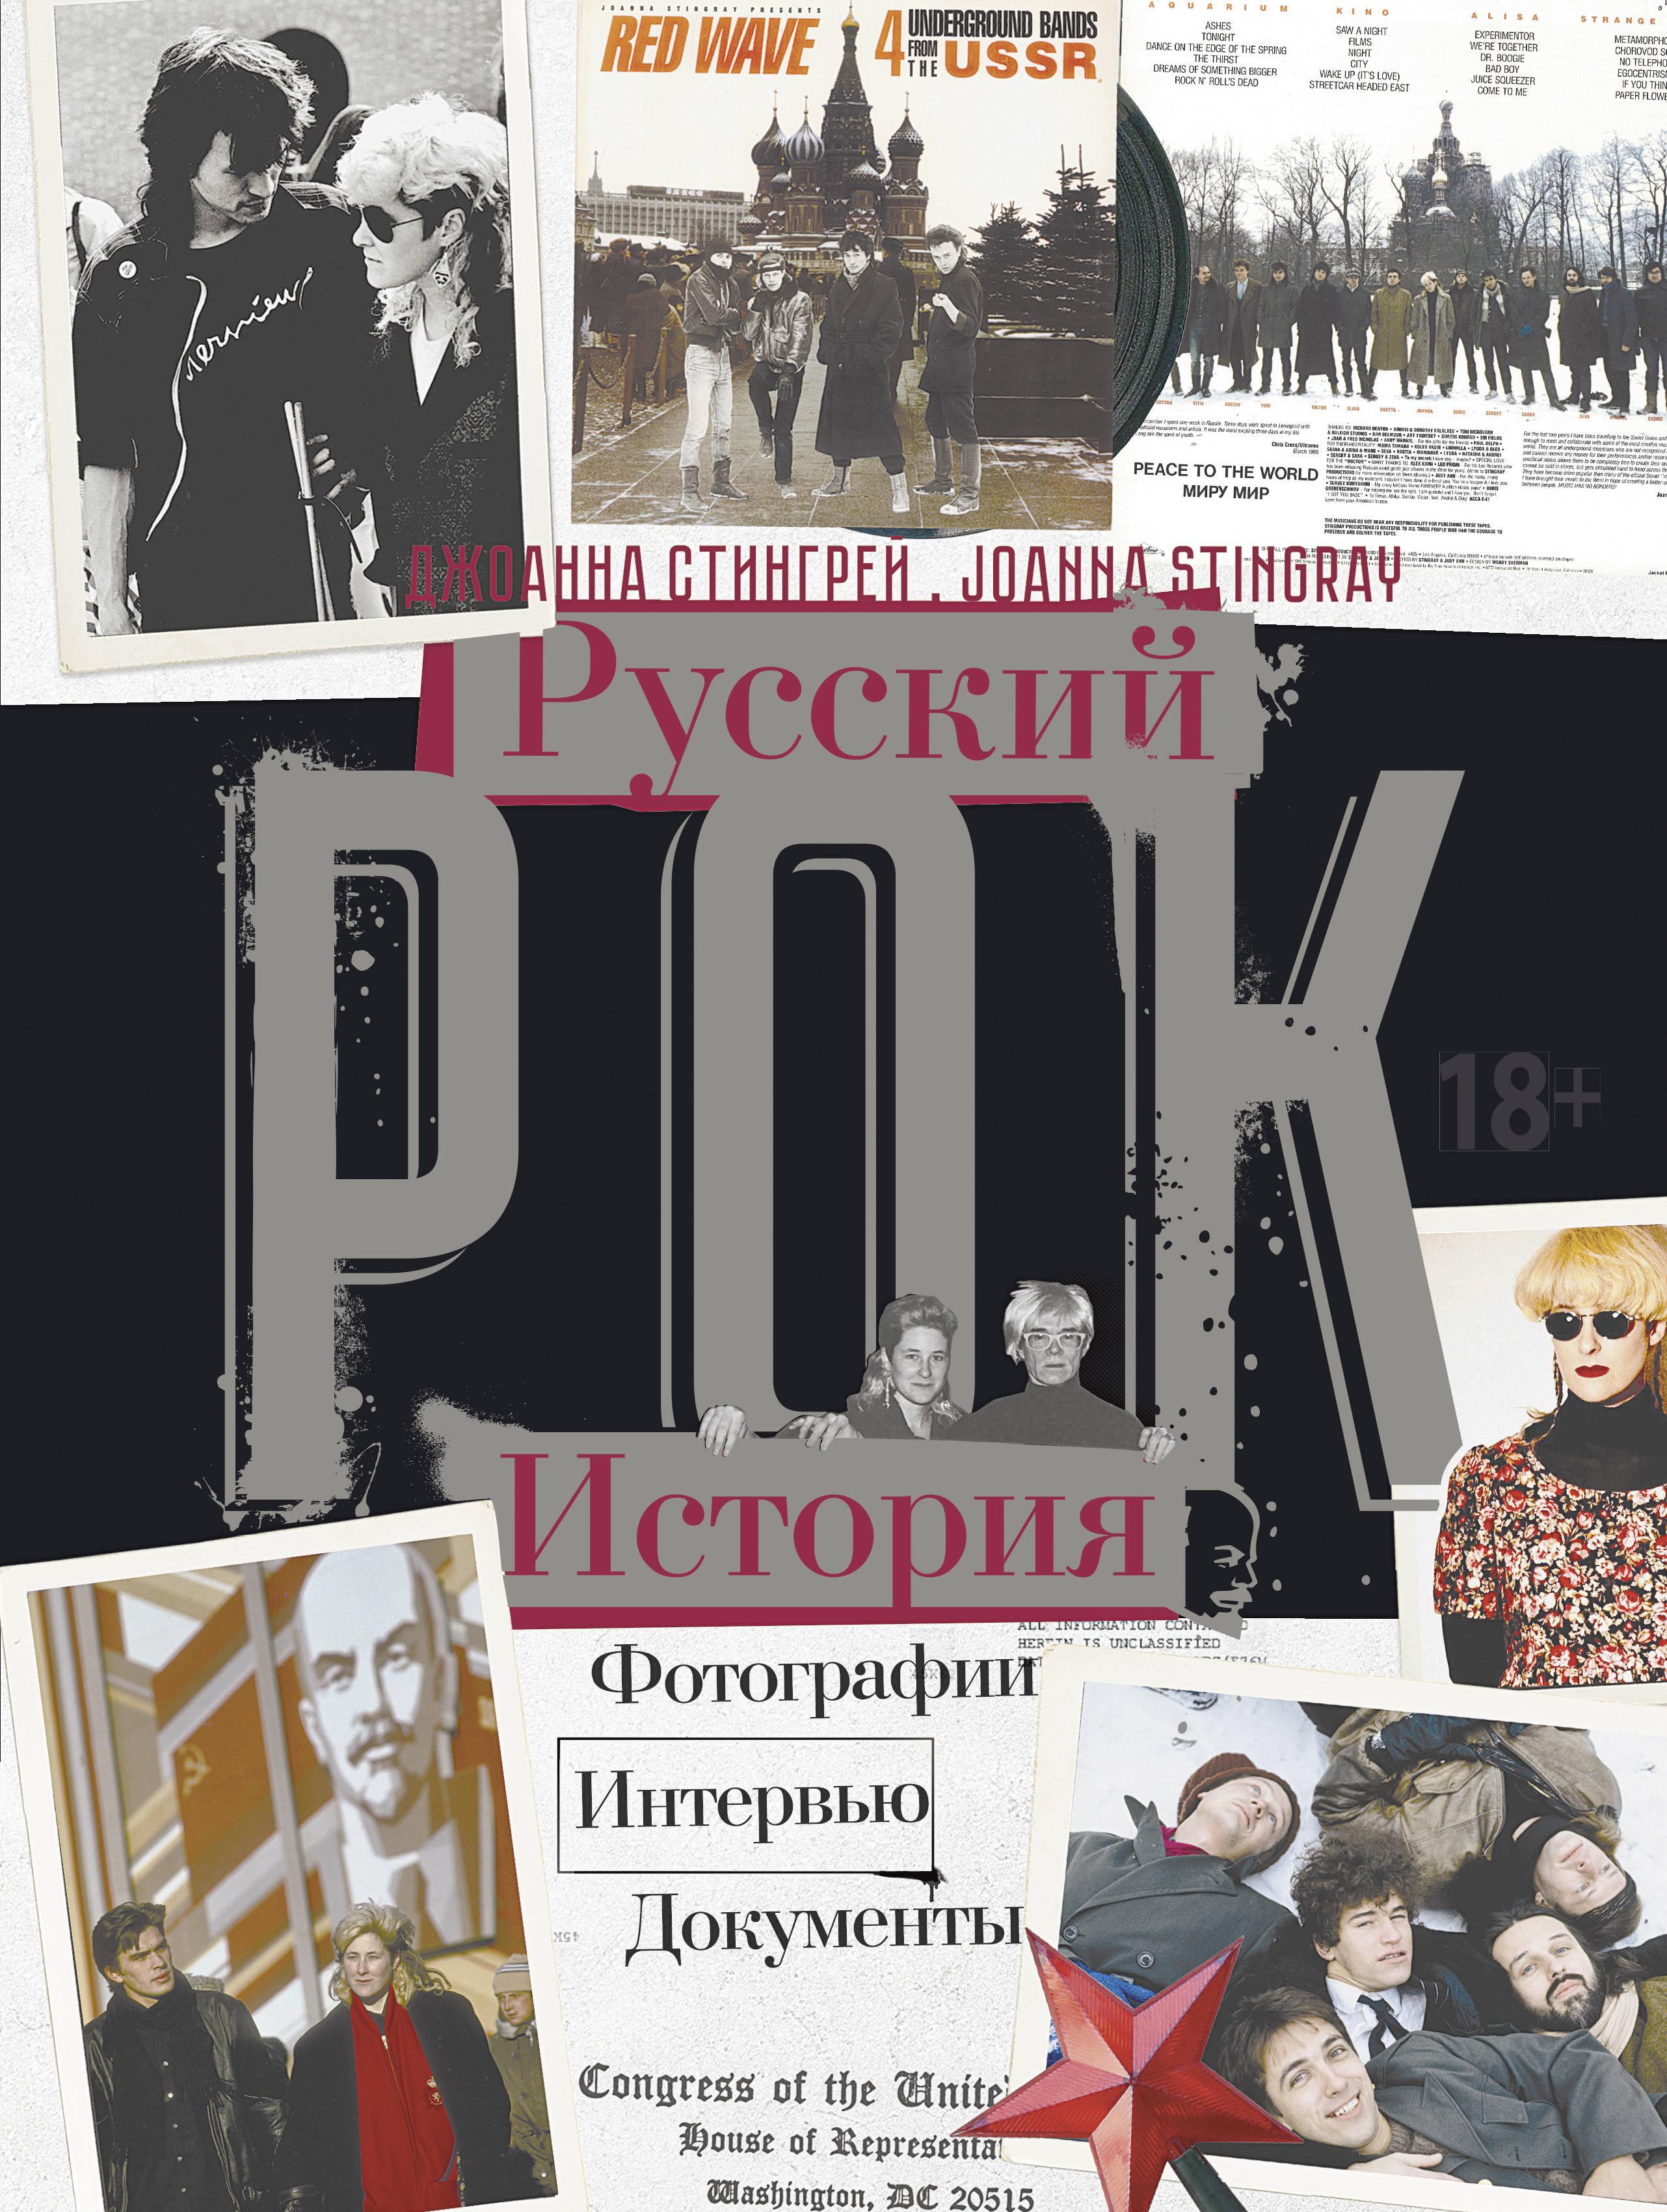 RUSSKIJ ROK. ISTORIJa. Fotografii. Intervju. Dokumenty